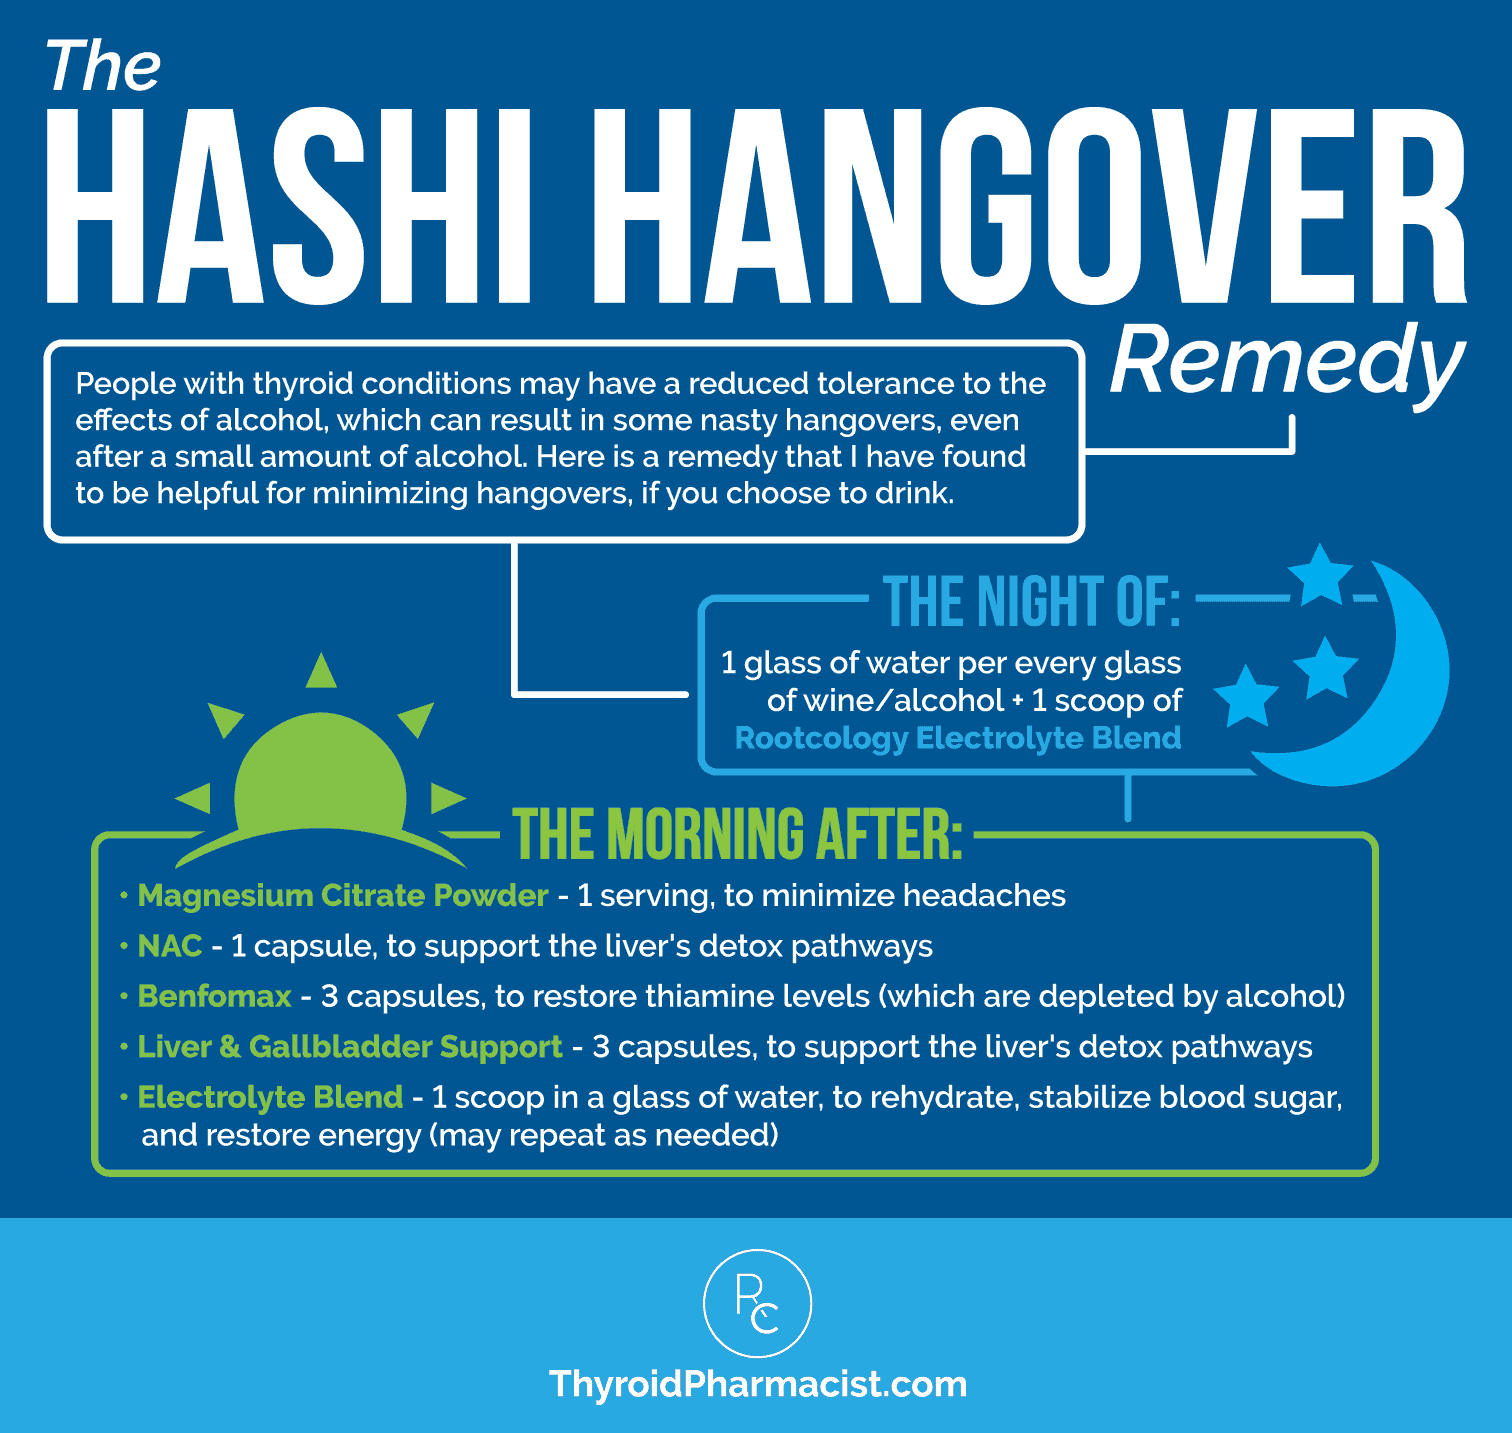 The Hashi Hangover Remedy Infographic - Thyroid Pharmacist